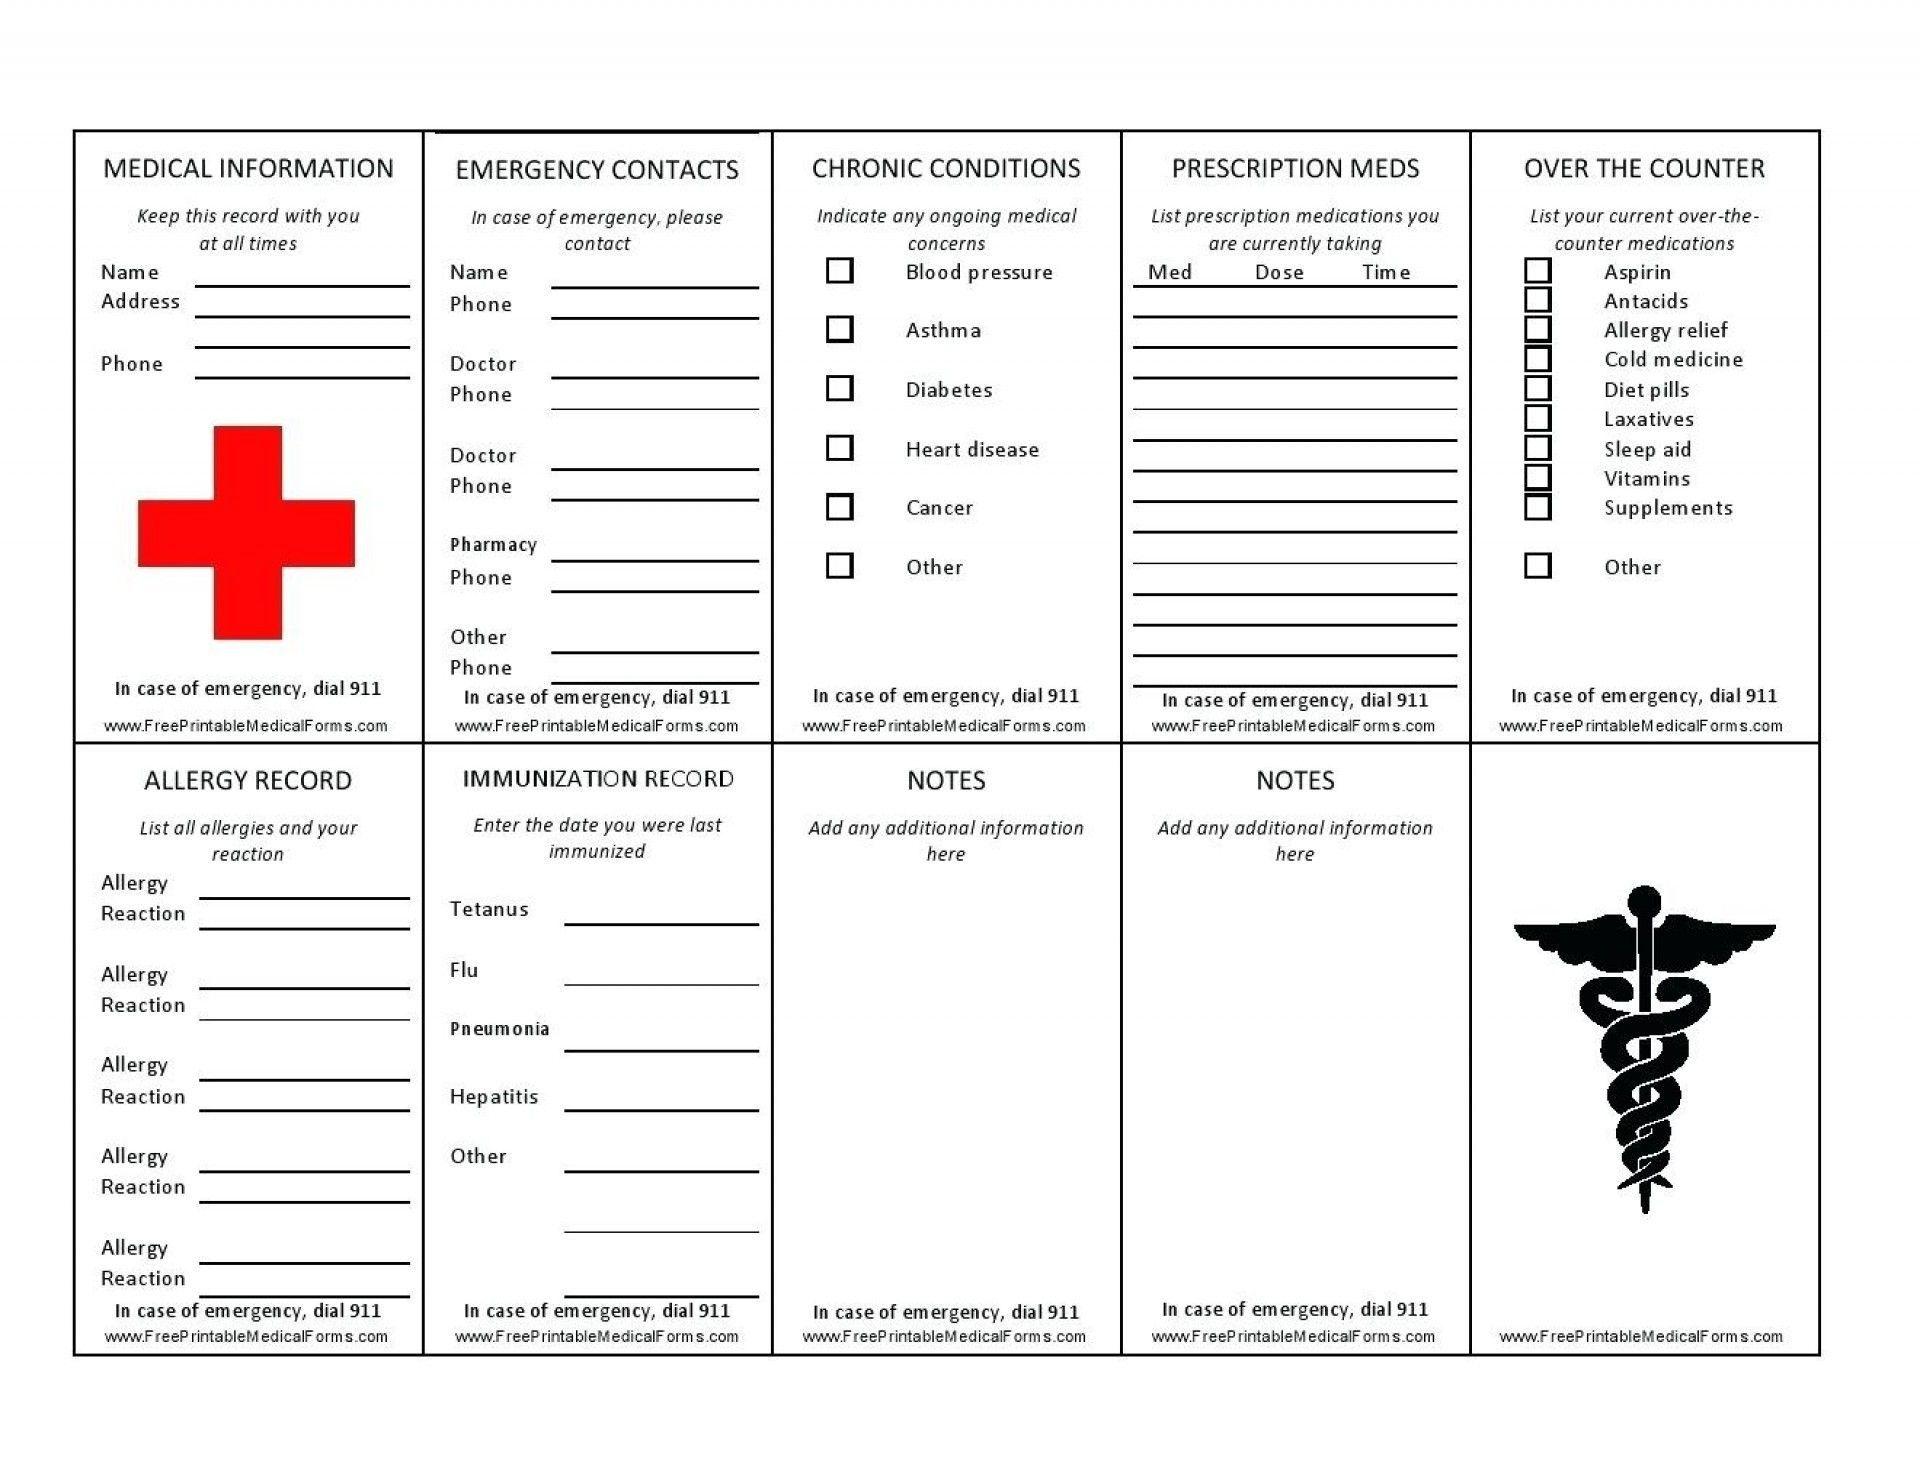 007 Imposing Medical Wallet Card Template Design  Free Alert Canada InformationFull